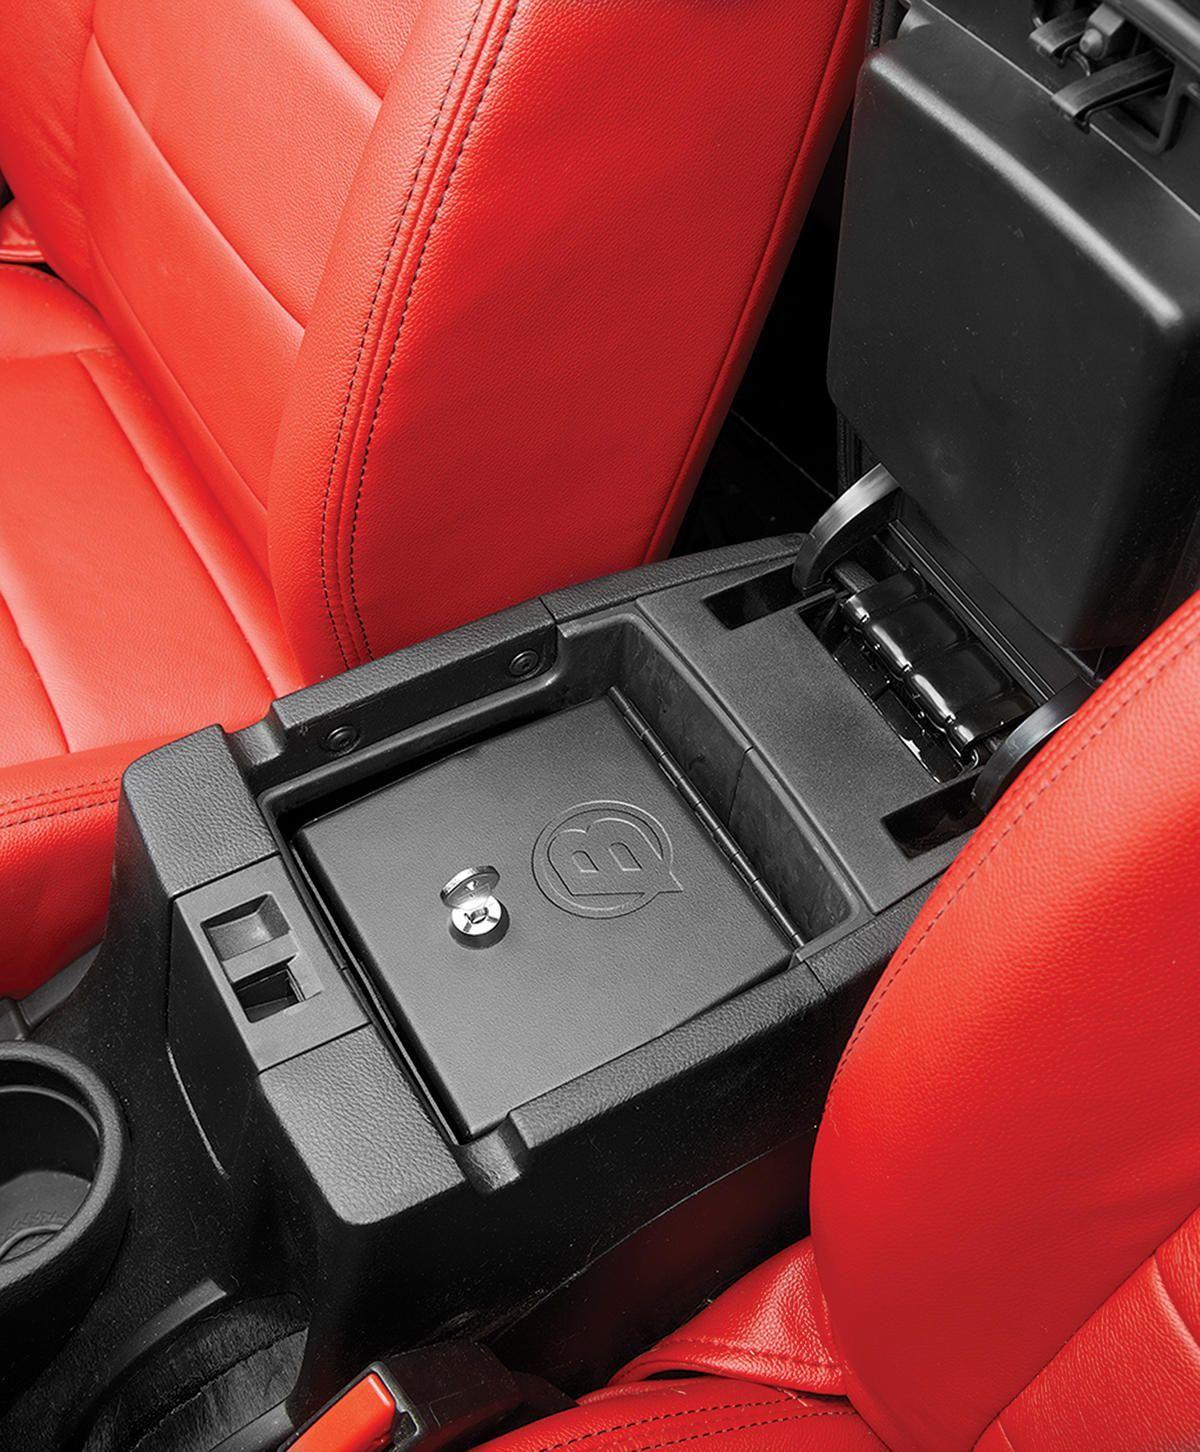 We Offer Only The Best Selection Of Jk Jeep Wrangler Interior Mods